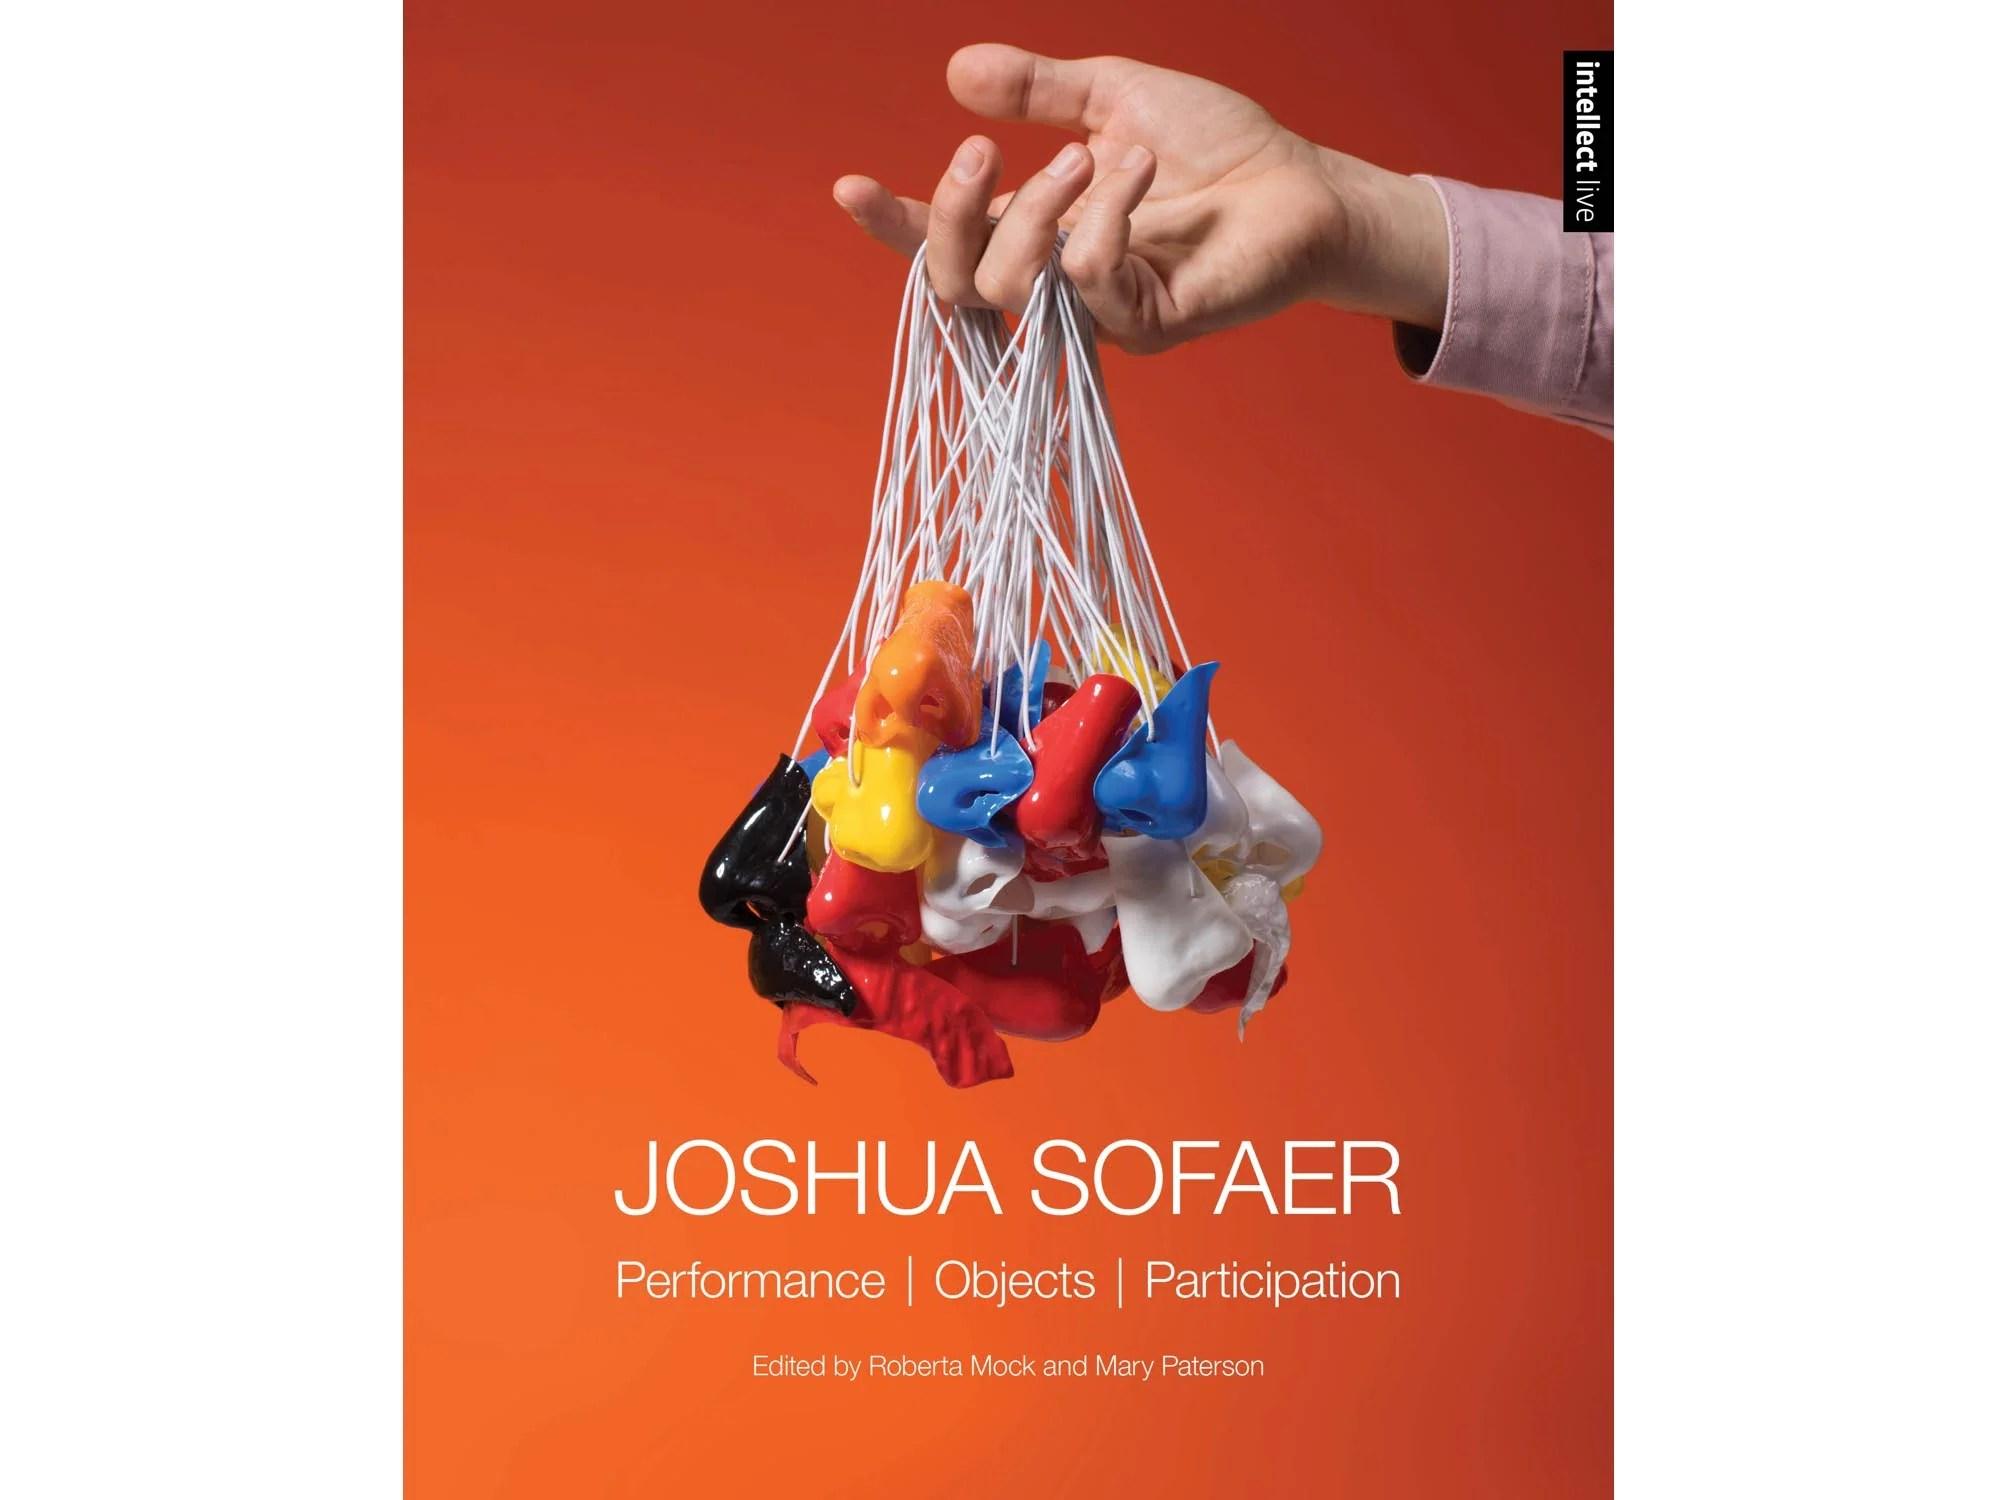 Joshua Sofaer Performance Objects Participation Unbound